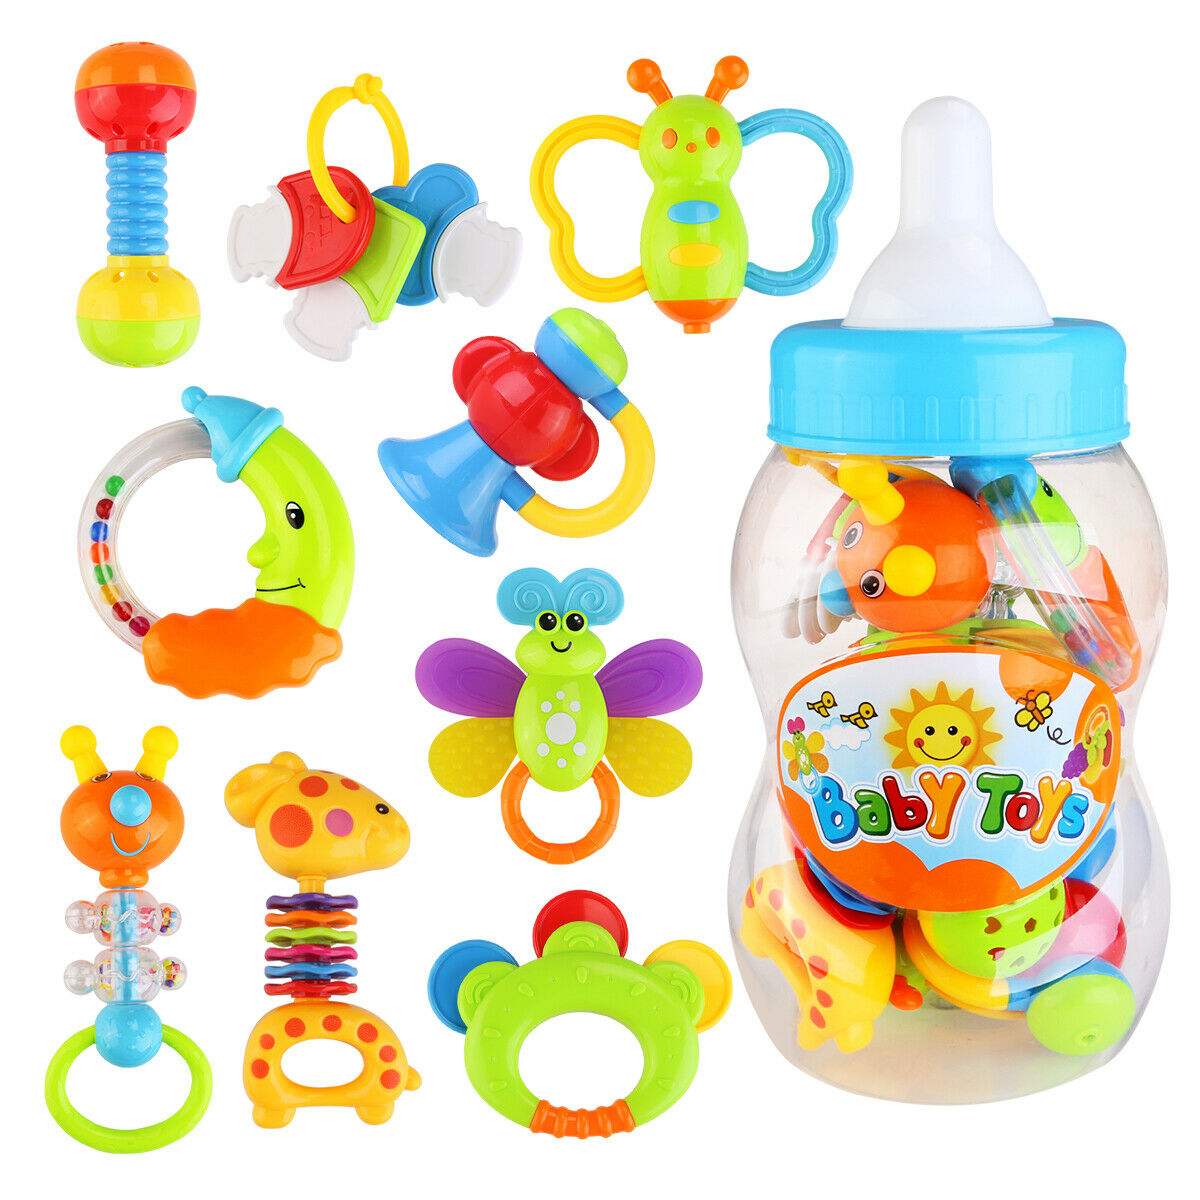 9 stk Baby Spielzeug Motorik Rasseln Greiflinge Rassel Babyrassel 0 Monate DHL